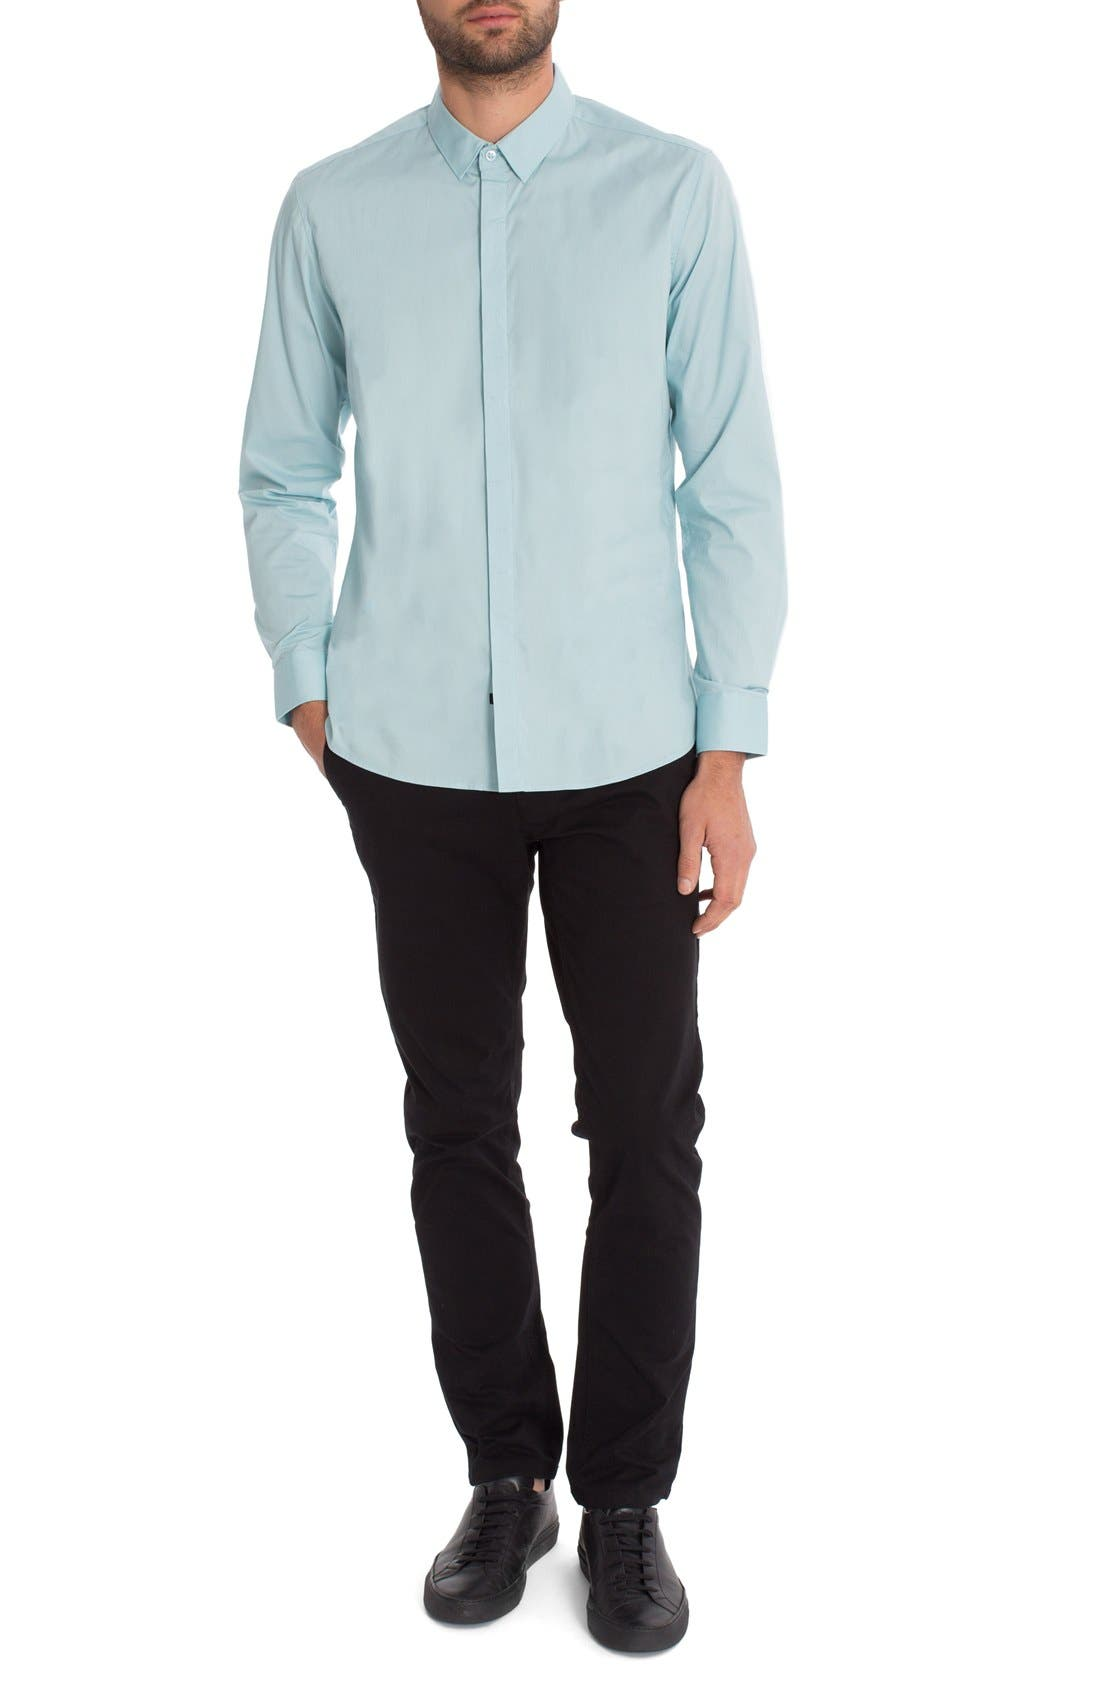 'Peace Train' Trim Fit Woven Shirt,                             Alternate thumbnail 4, color,                             Sterling Blue